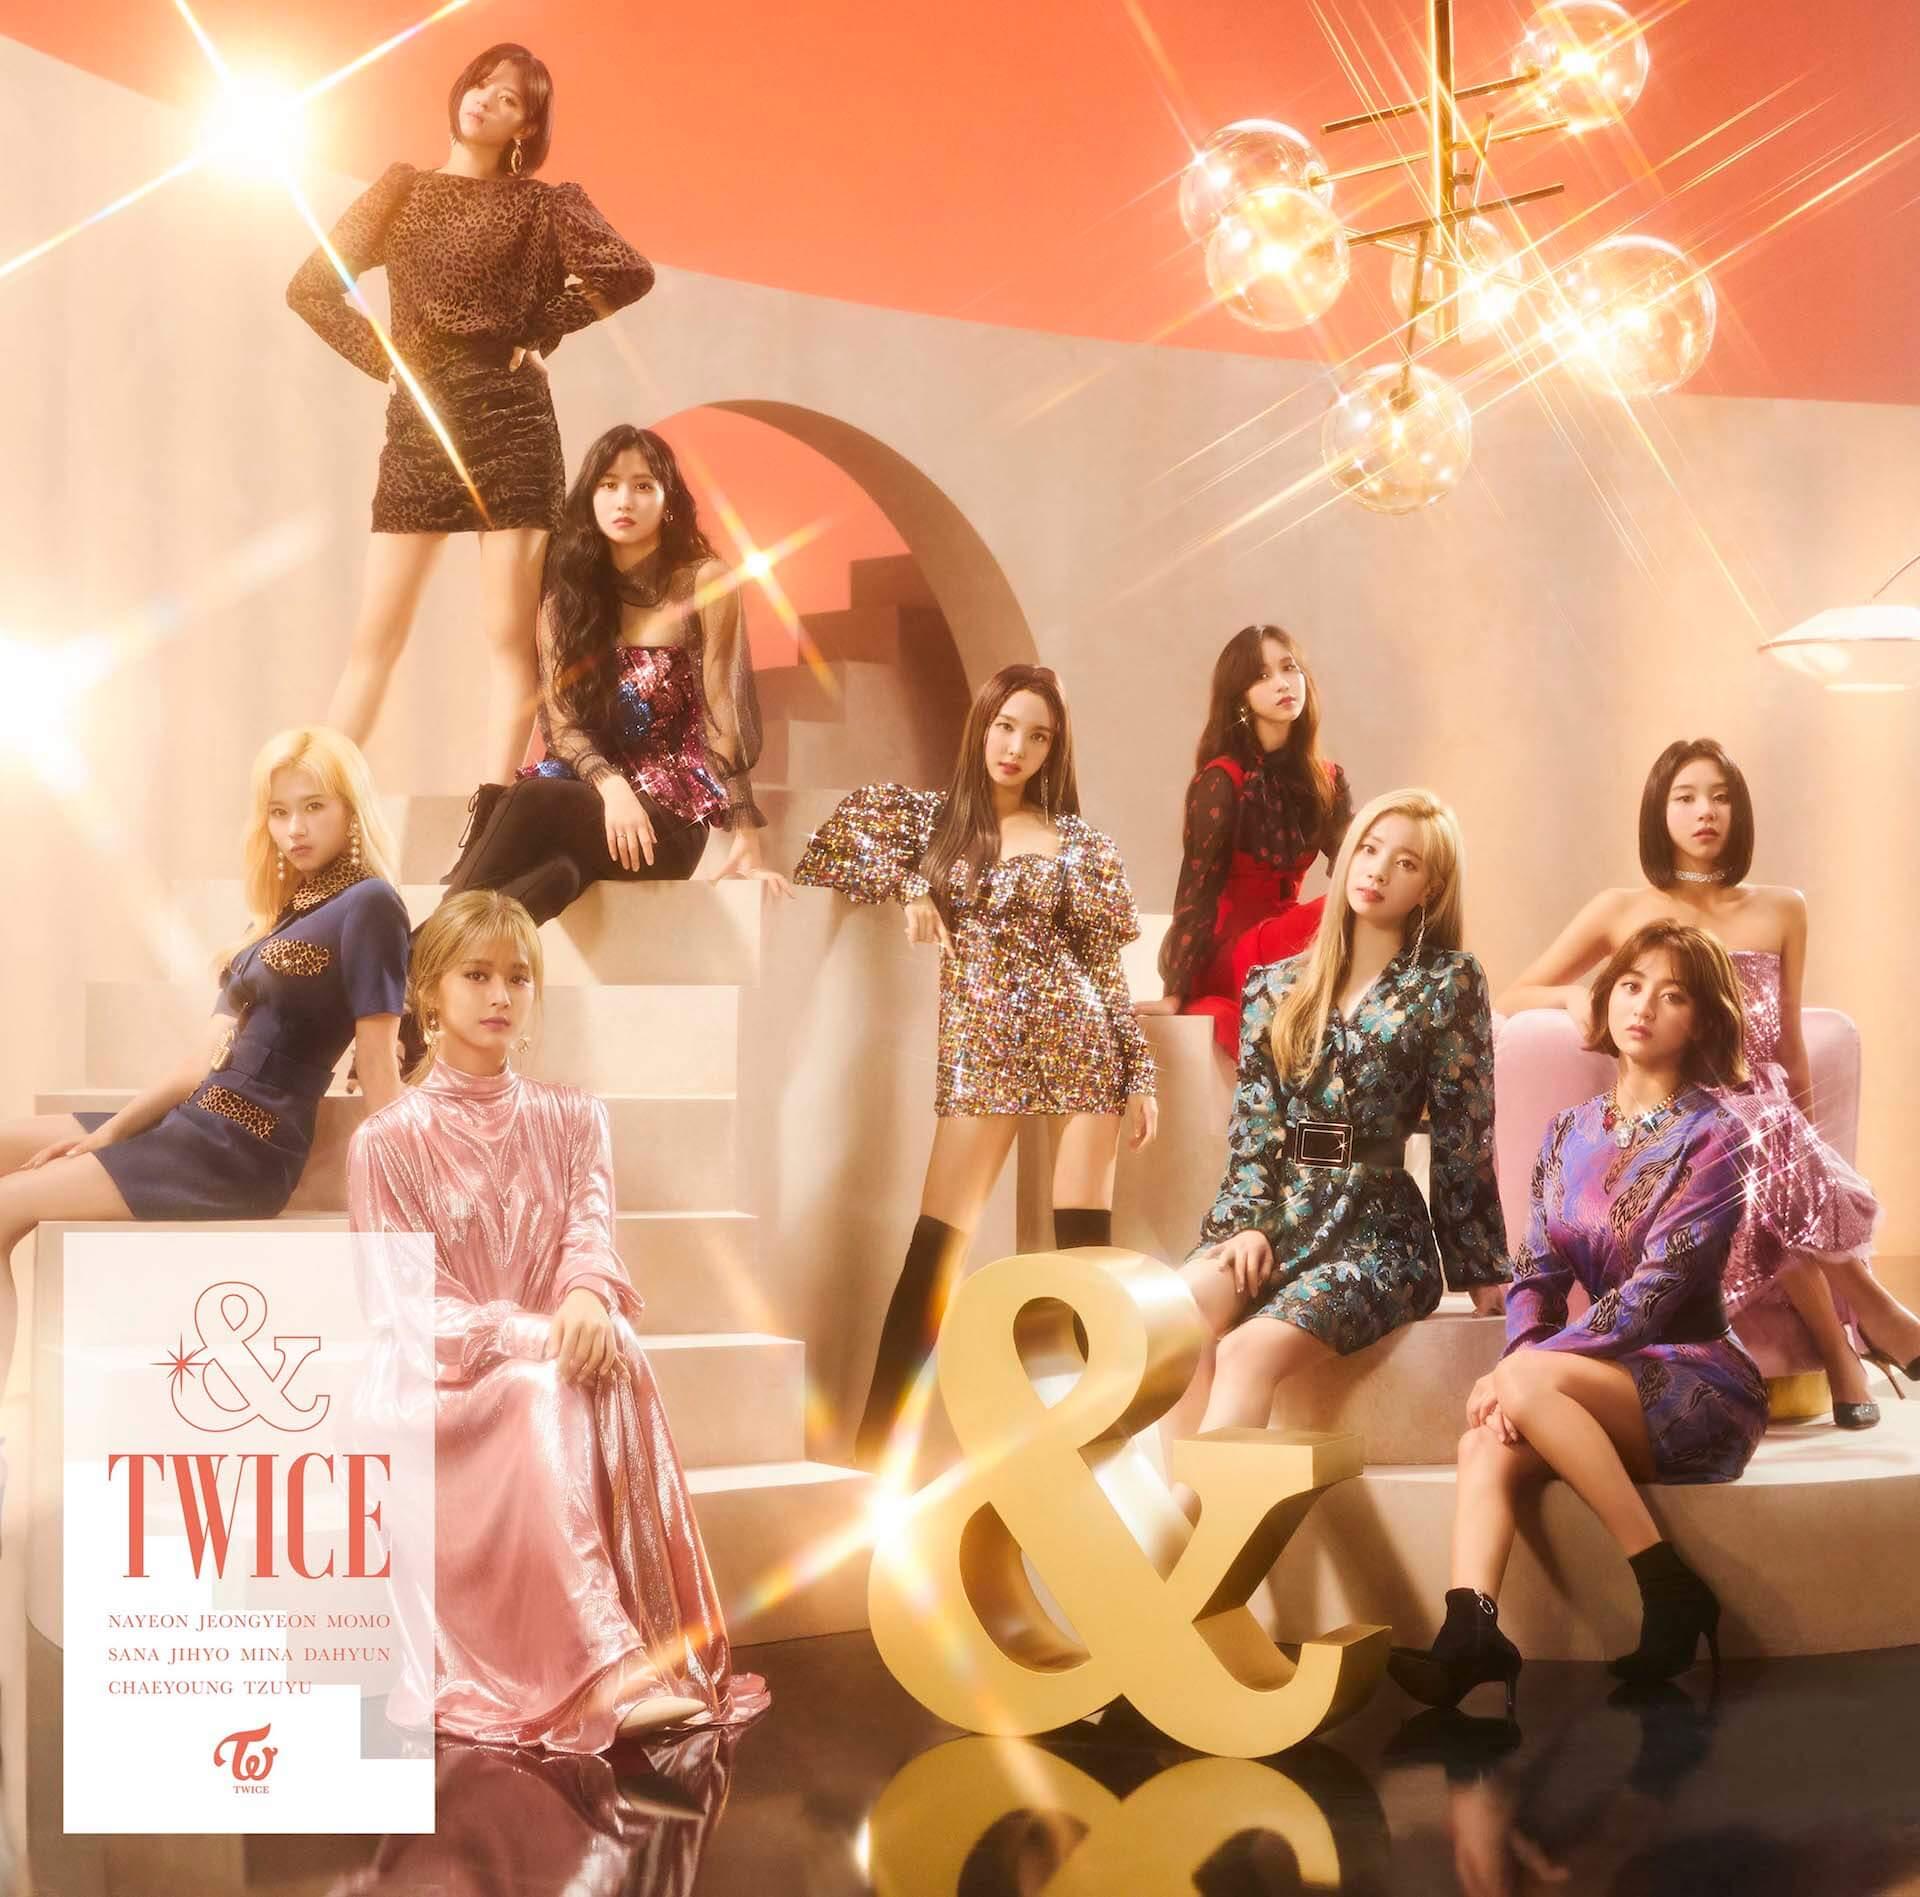 TWICEがJAPAN 2ndアルバム『&TWICE』から、リード曲「Fake & True」 のMVを解禁! music191018_twice_mv_4